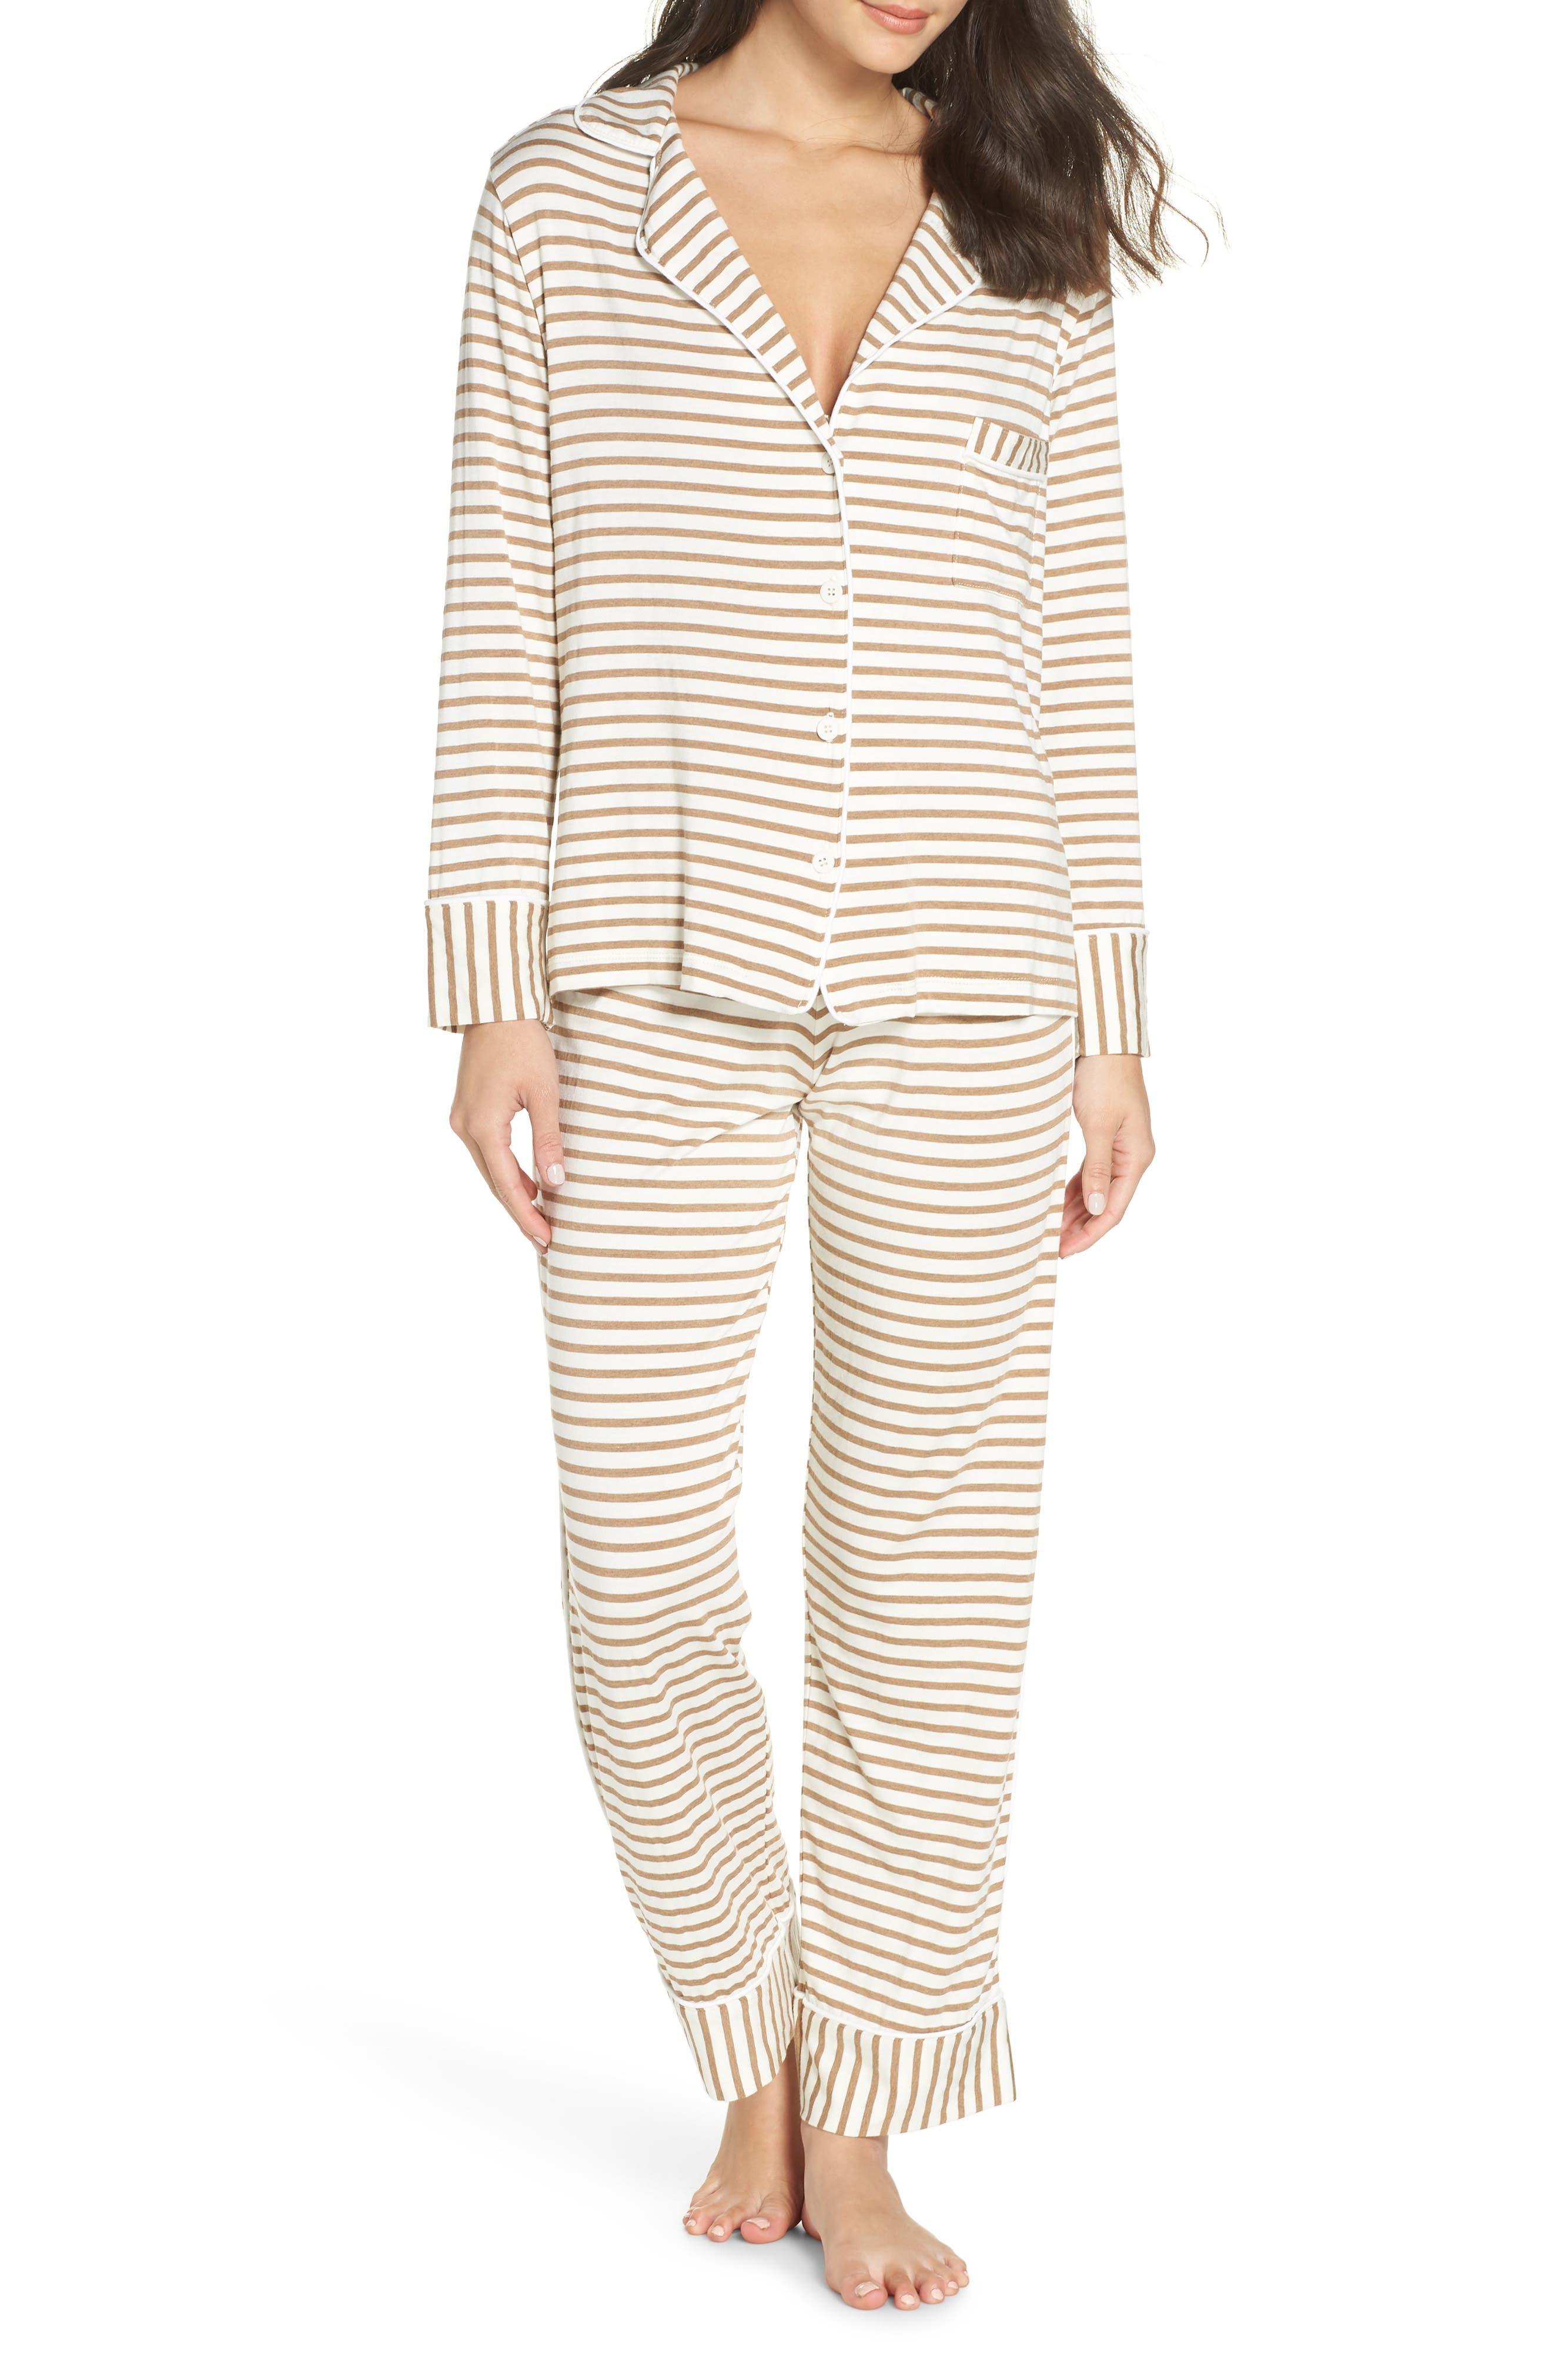 Monaco Pajamas,                         Main,                         color, CAMEL STRIPE